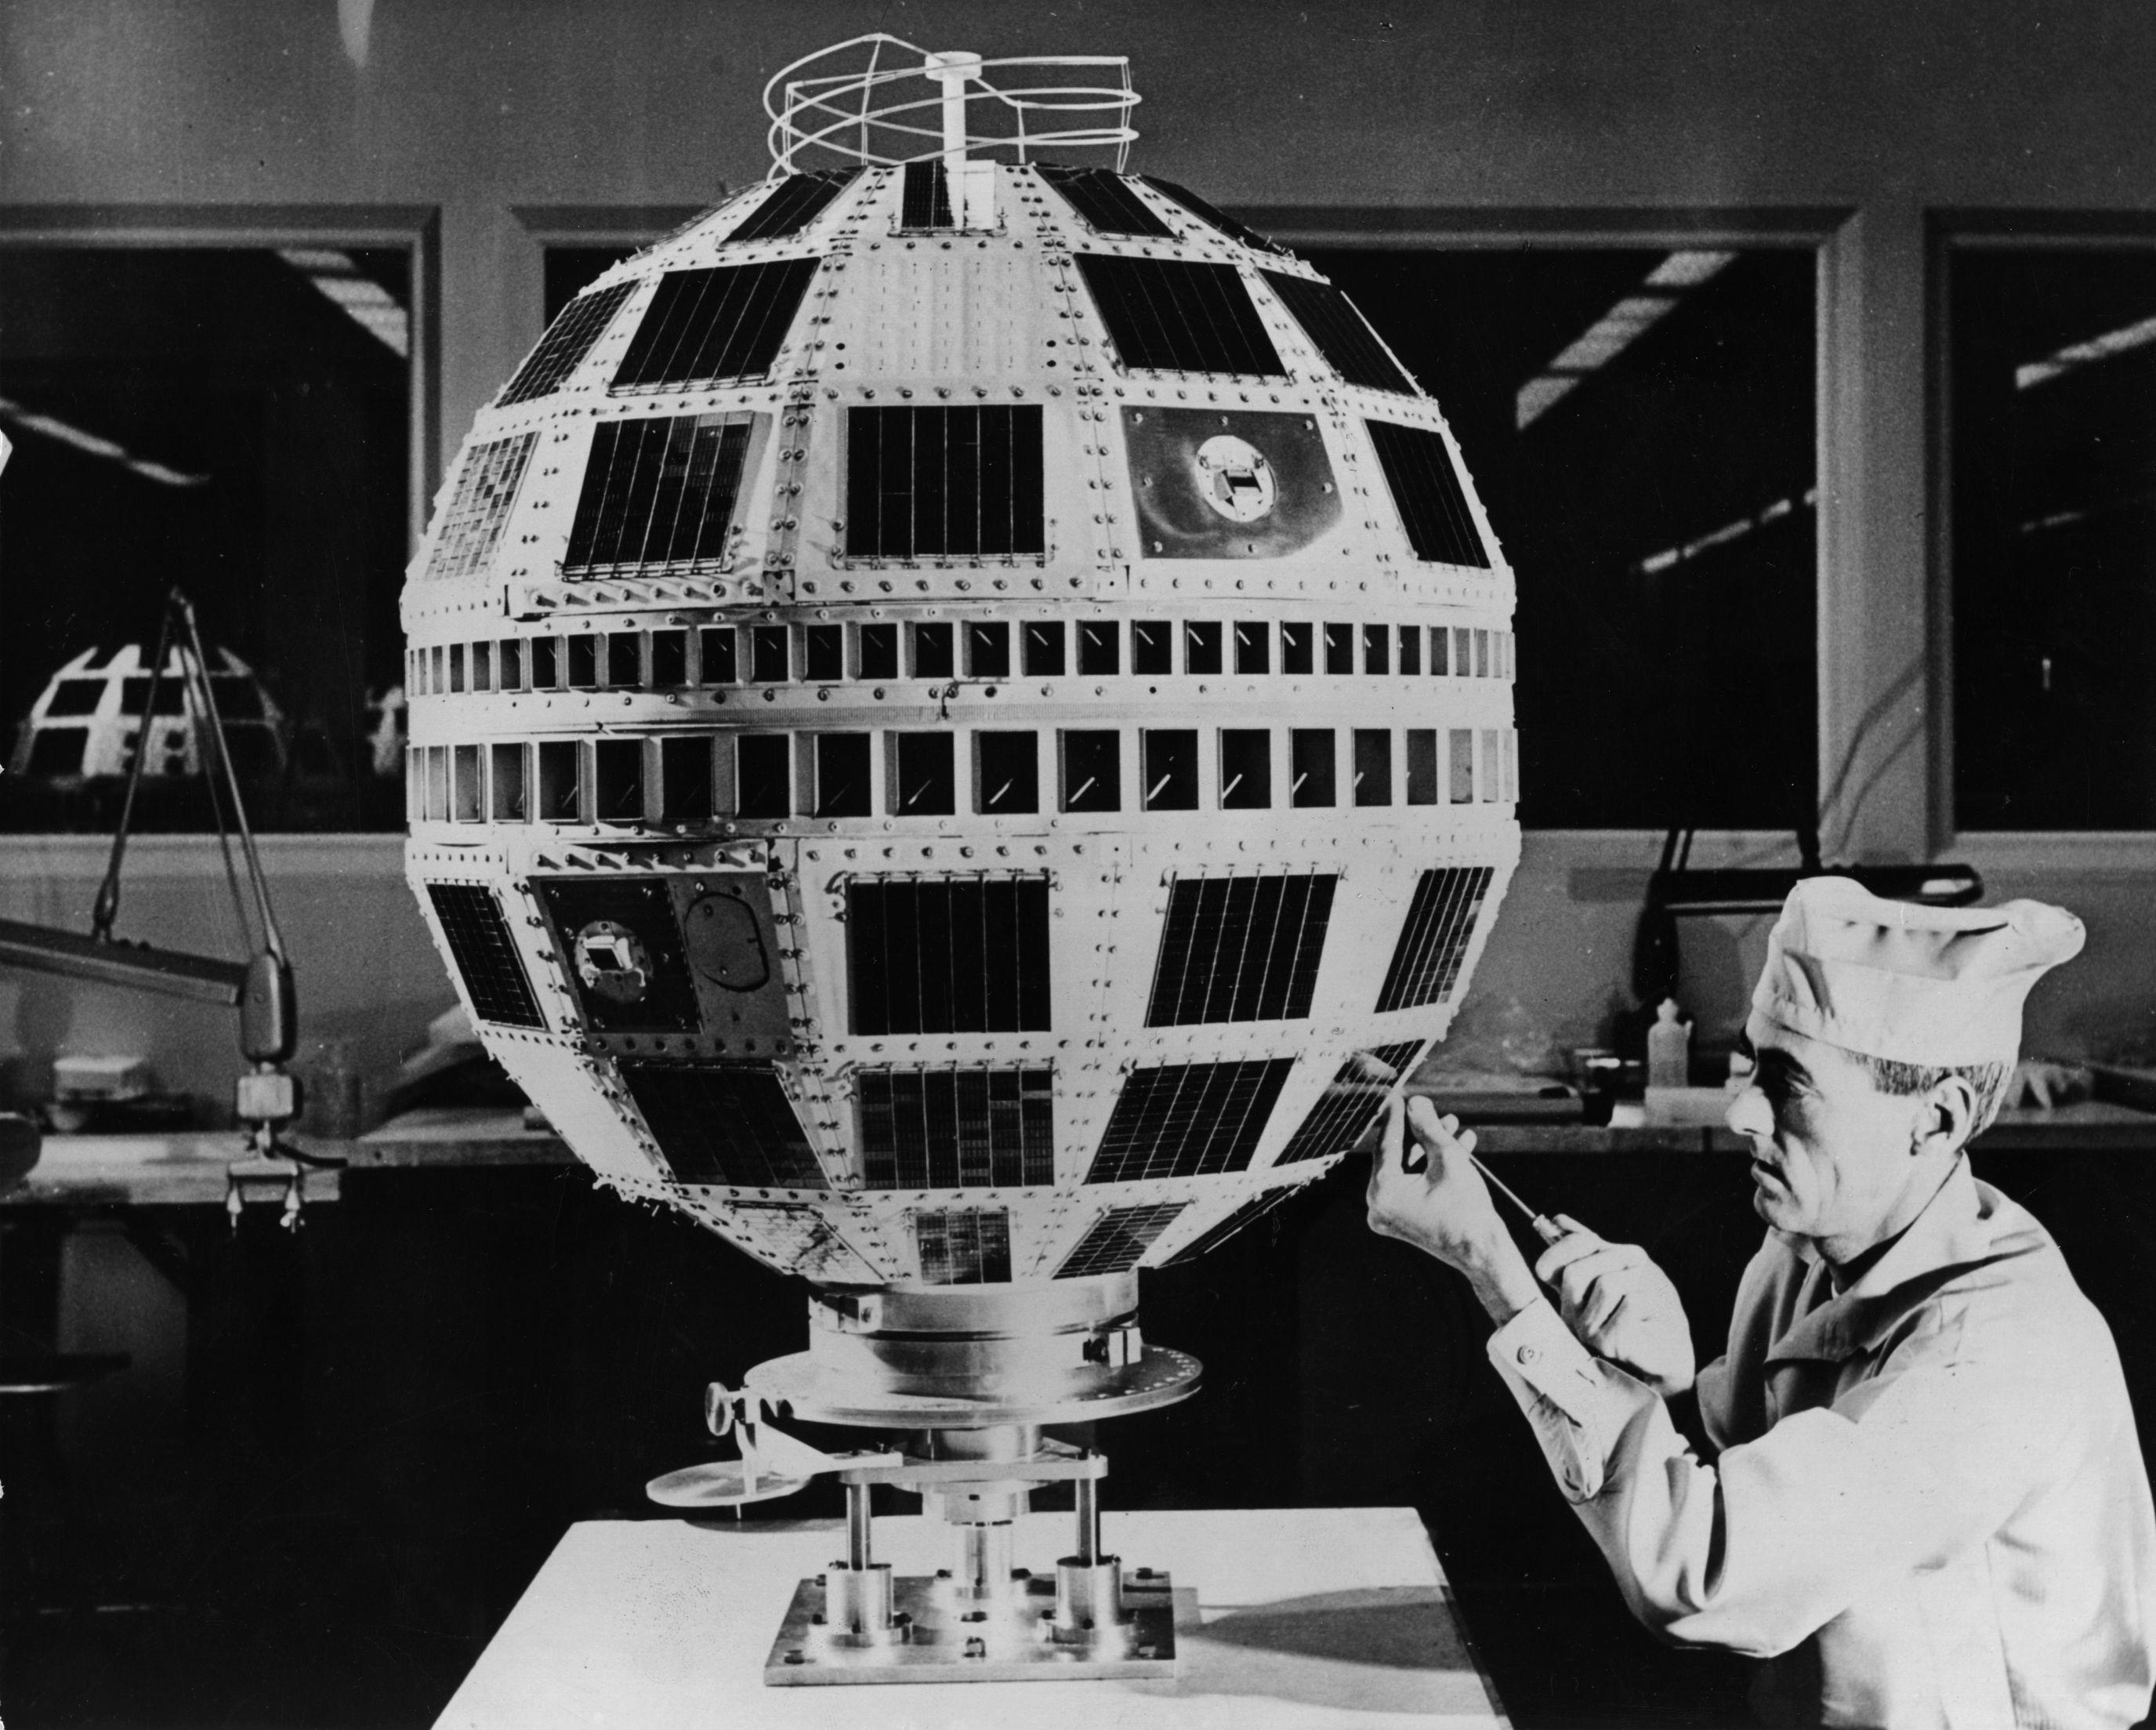 Telstar 1 fue el primer satélite comercial de comunicaciones